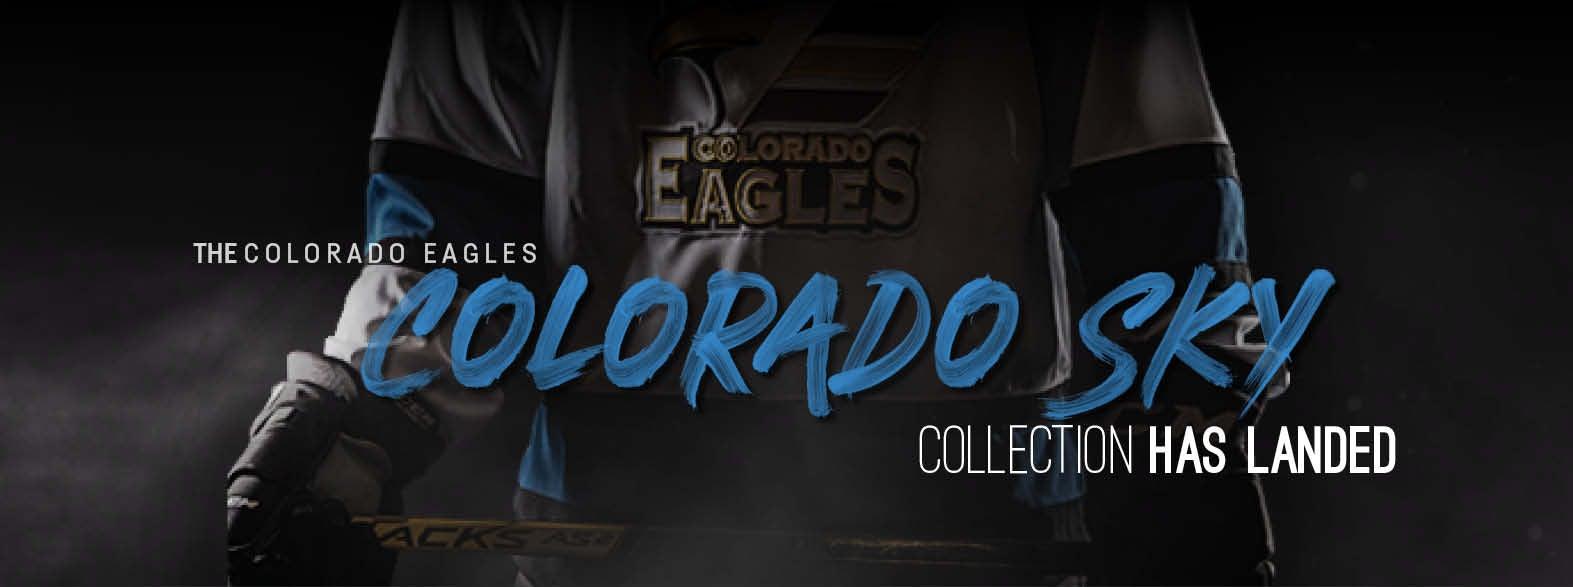 The Colorado Sky Collection Has Landed